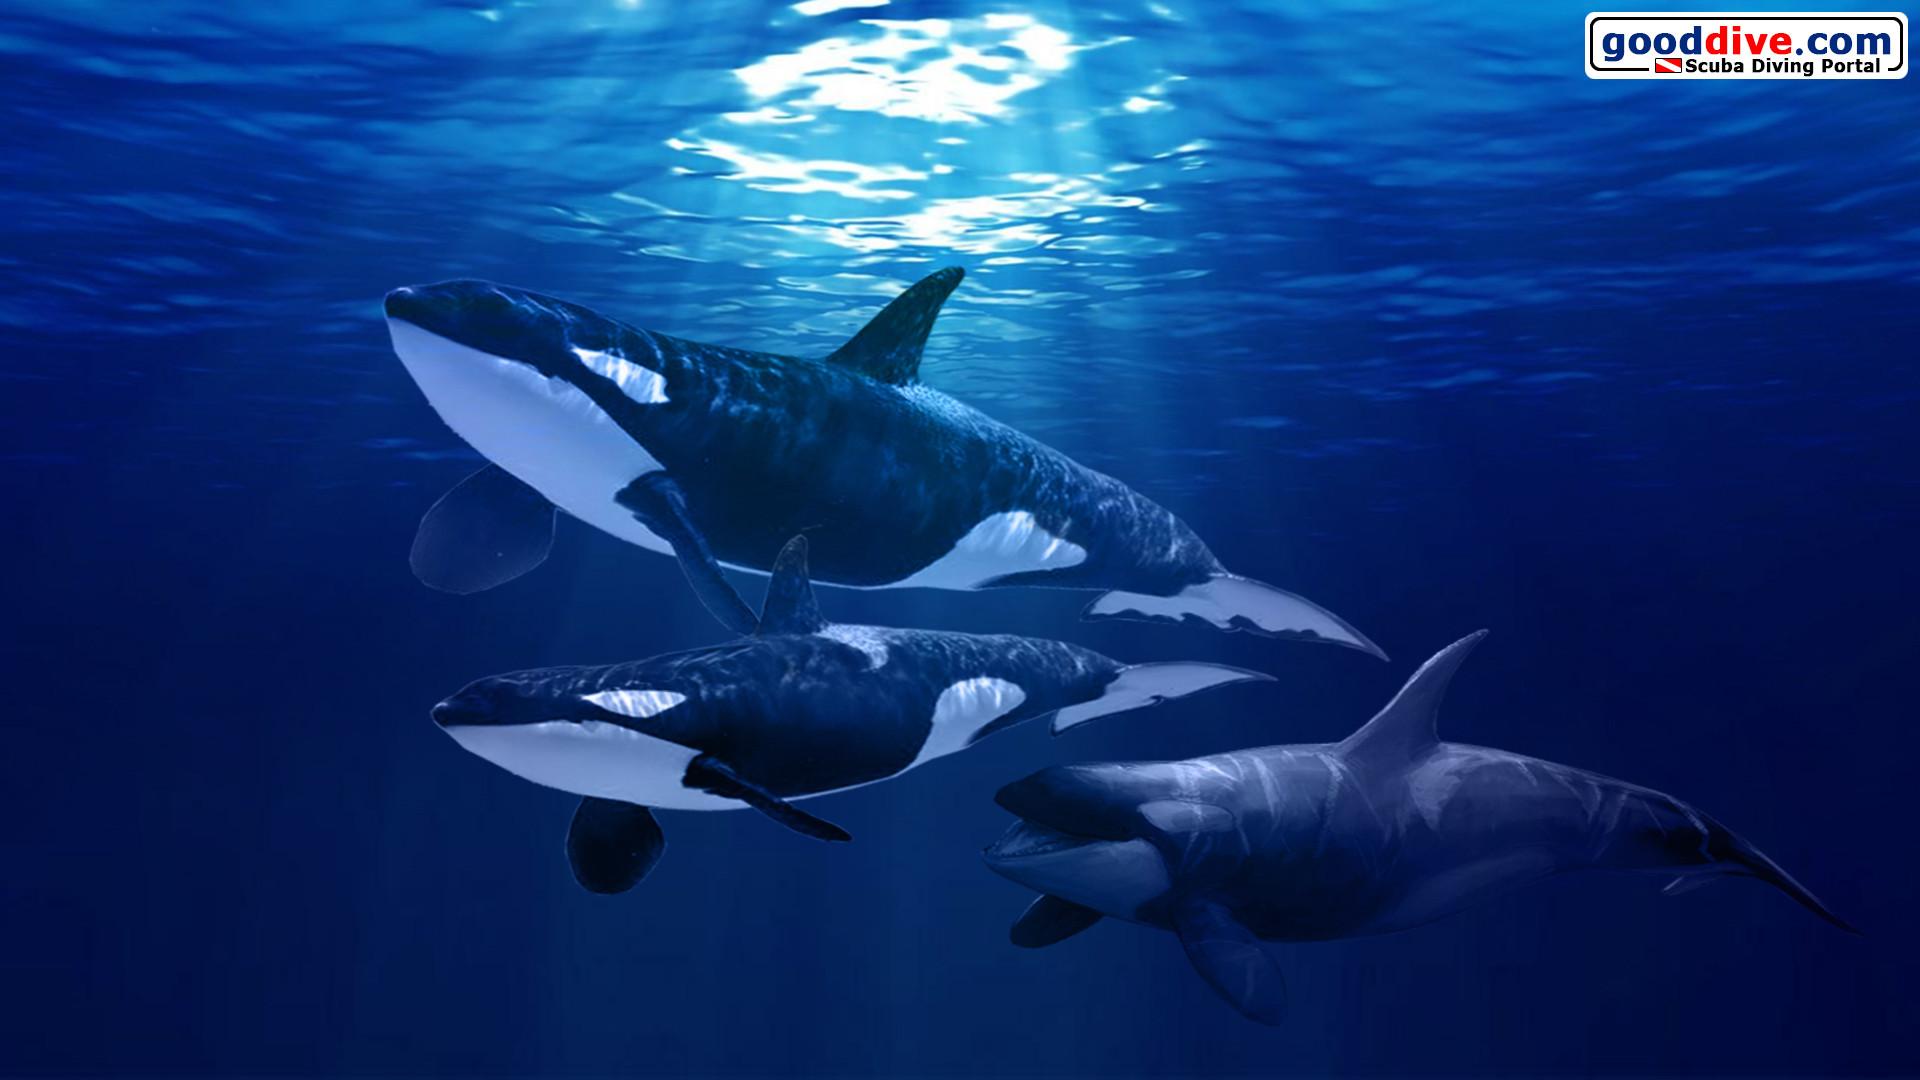 Killer whales wallpaper 53 images 2560x1440 altavistaventures Gallery